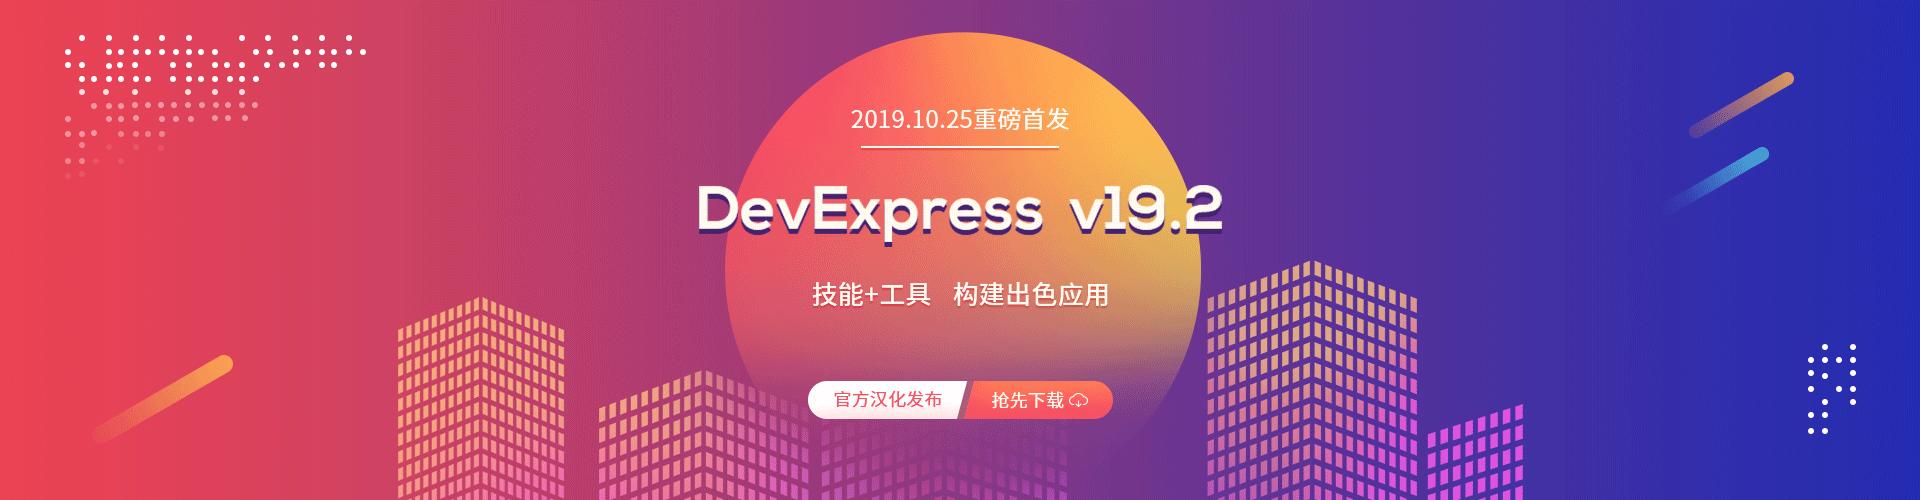 DevExpress v19.2全新发布,构建出色应用!